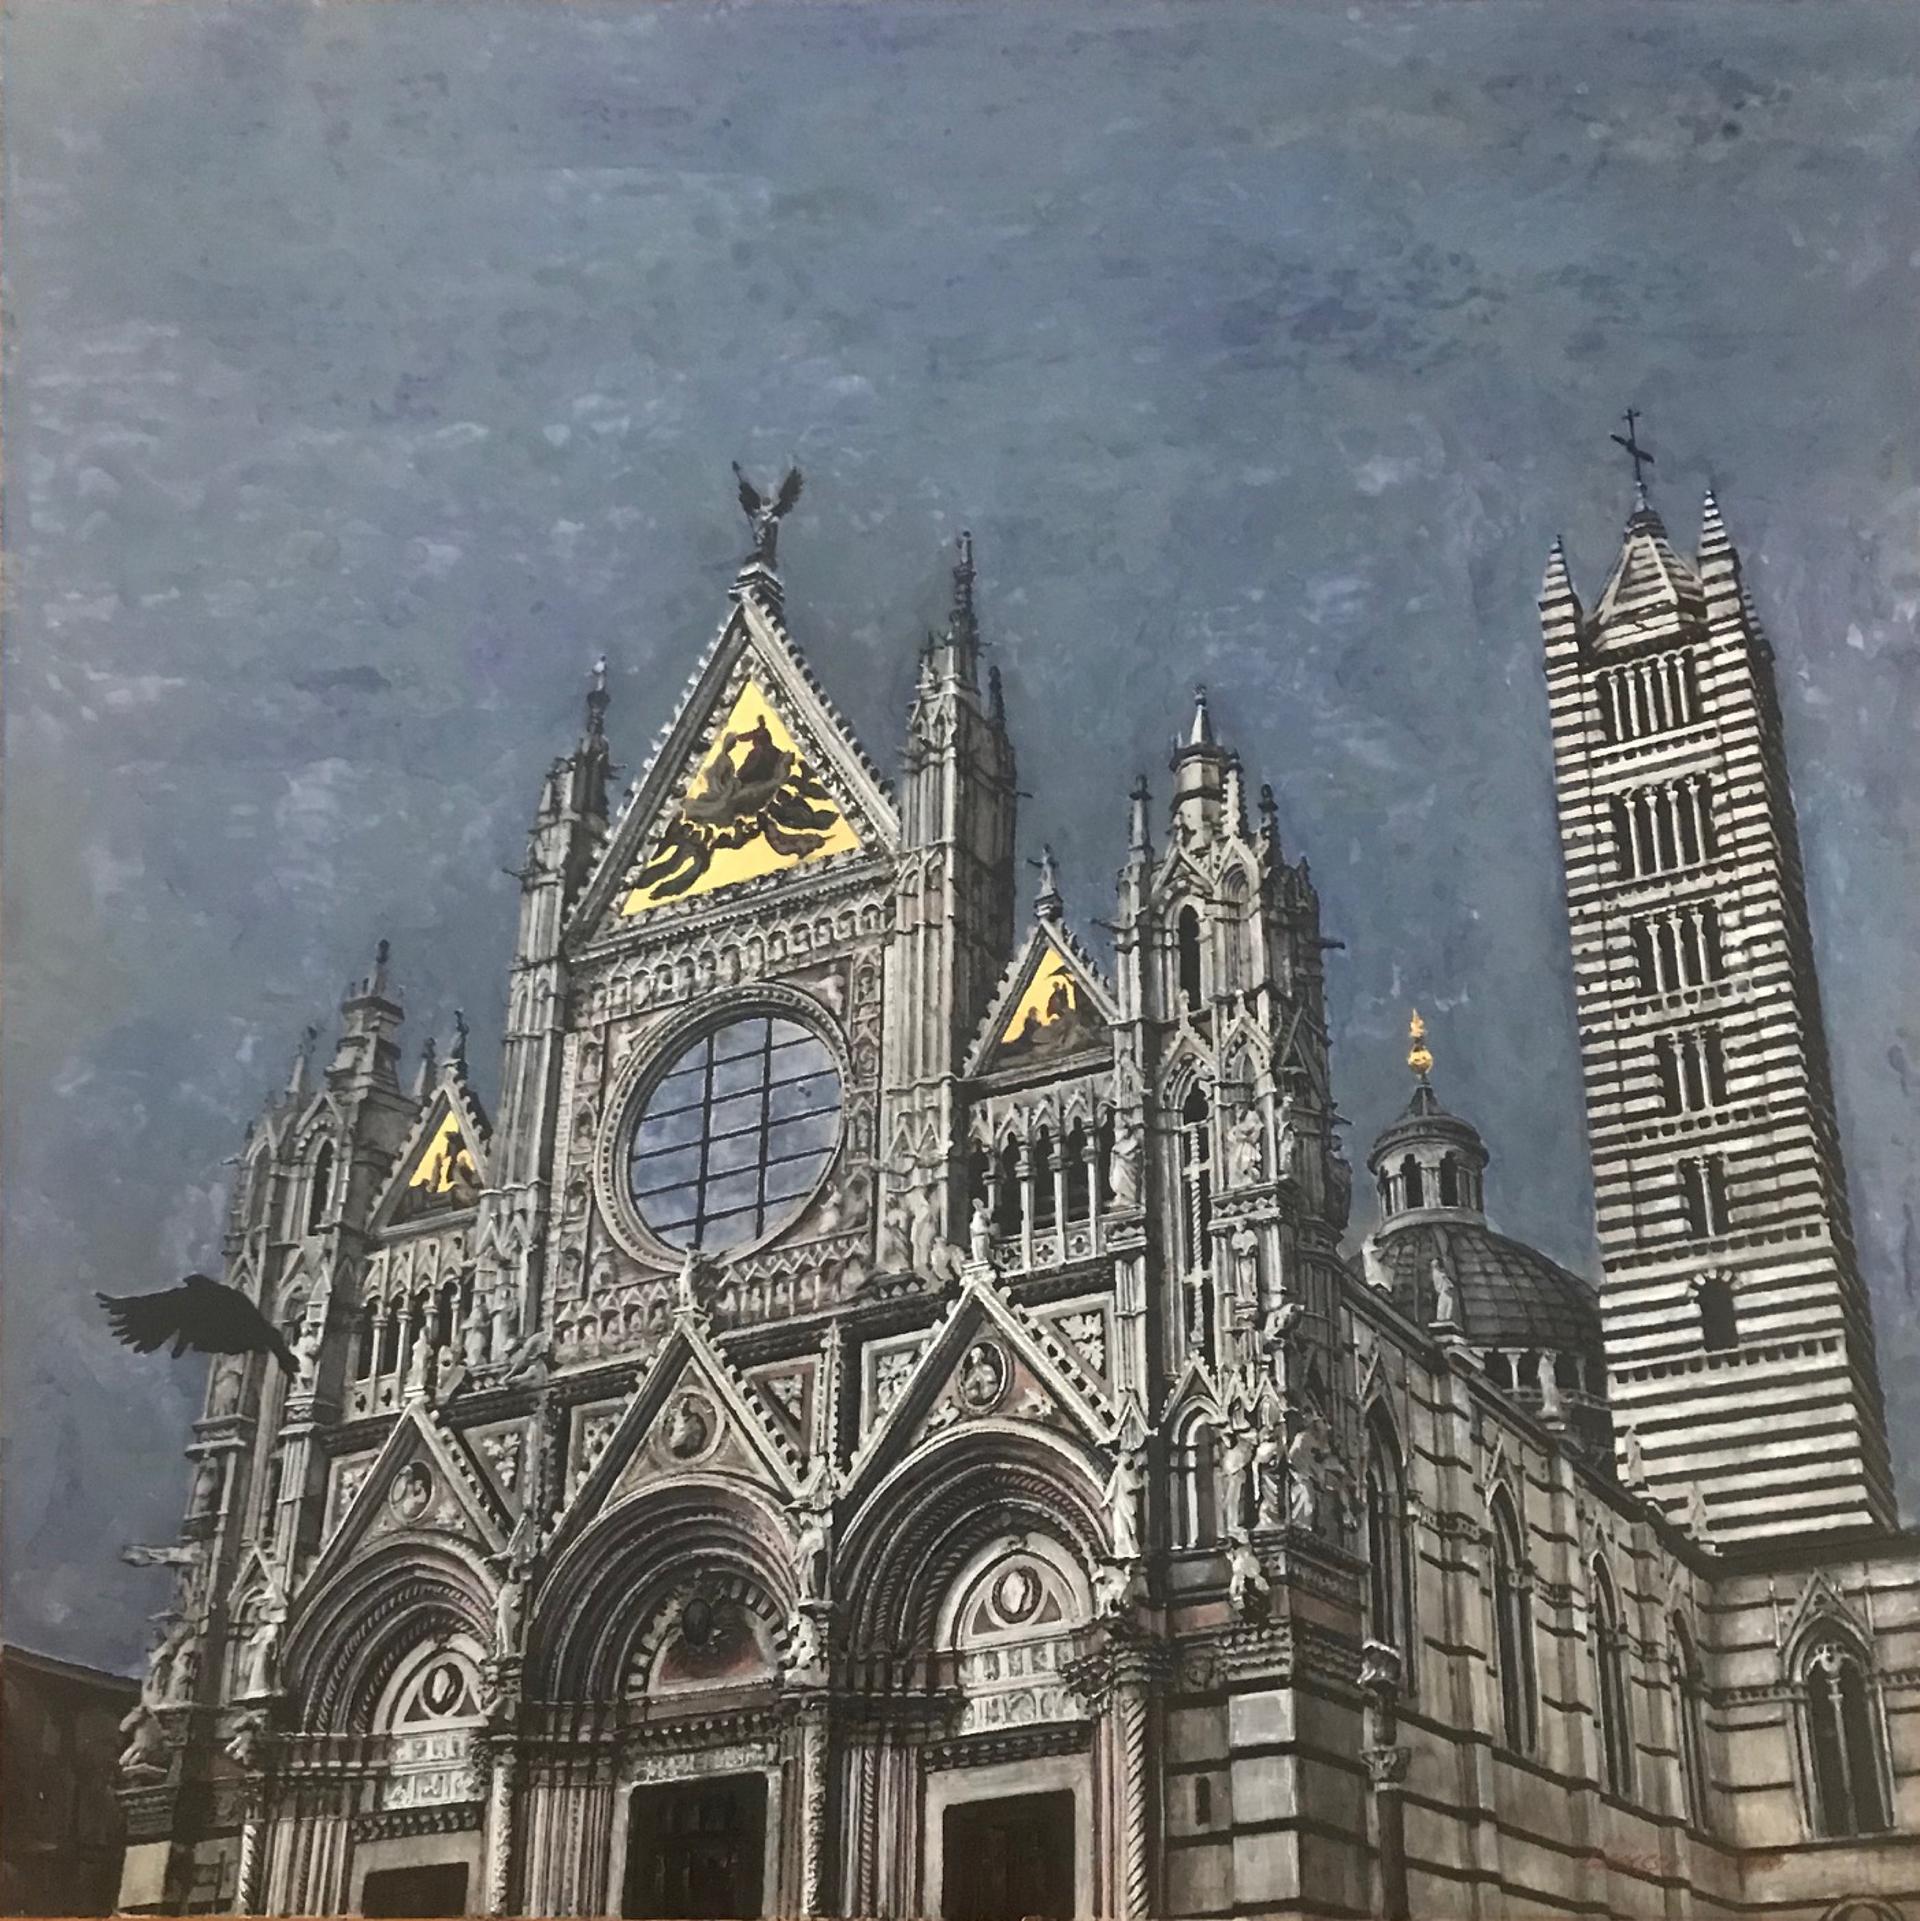 Il Duomo De Siena by Larissa Morais